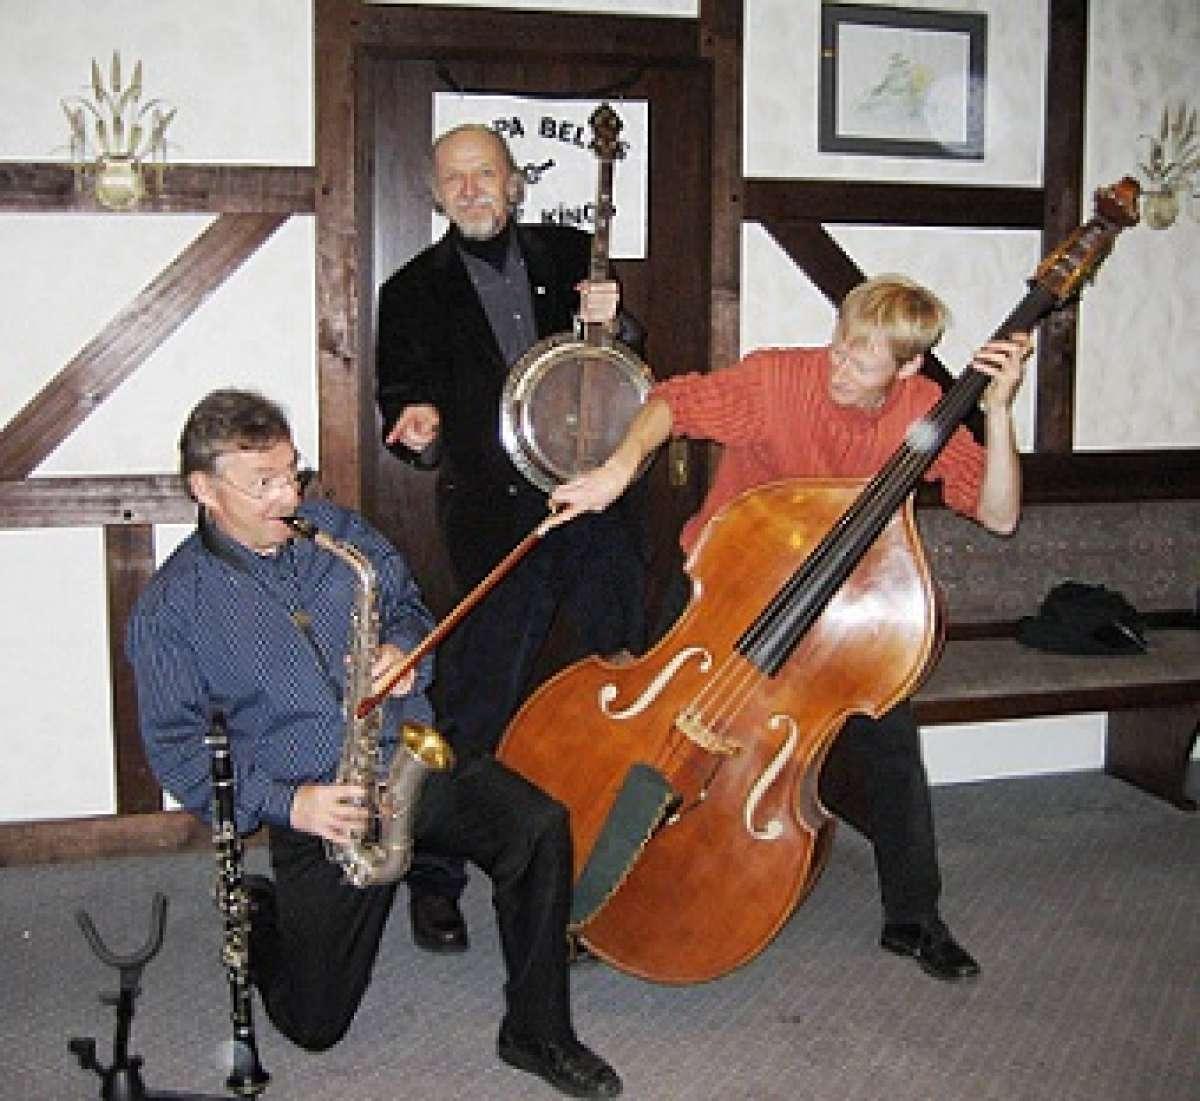 Jazzfrühschoppen - Papa Belas Dixie Kings - Waldhotel Schäferberg - Espenau